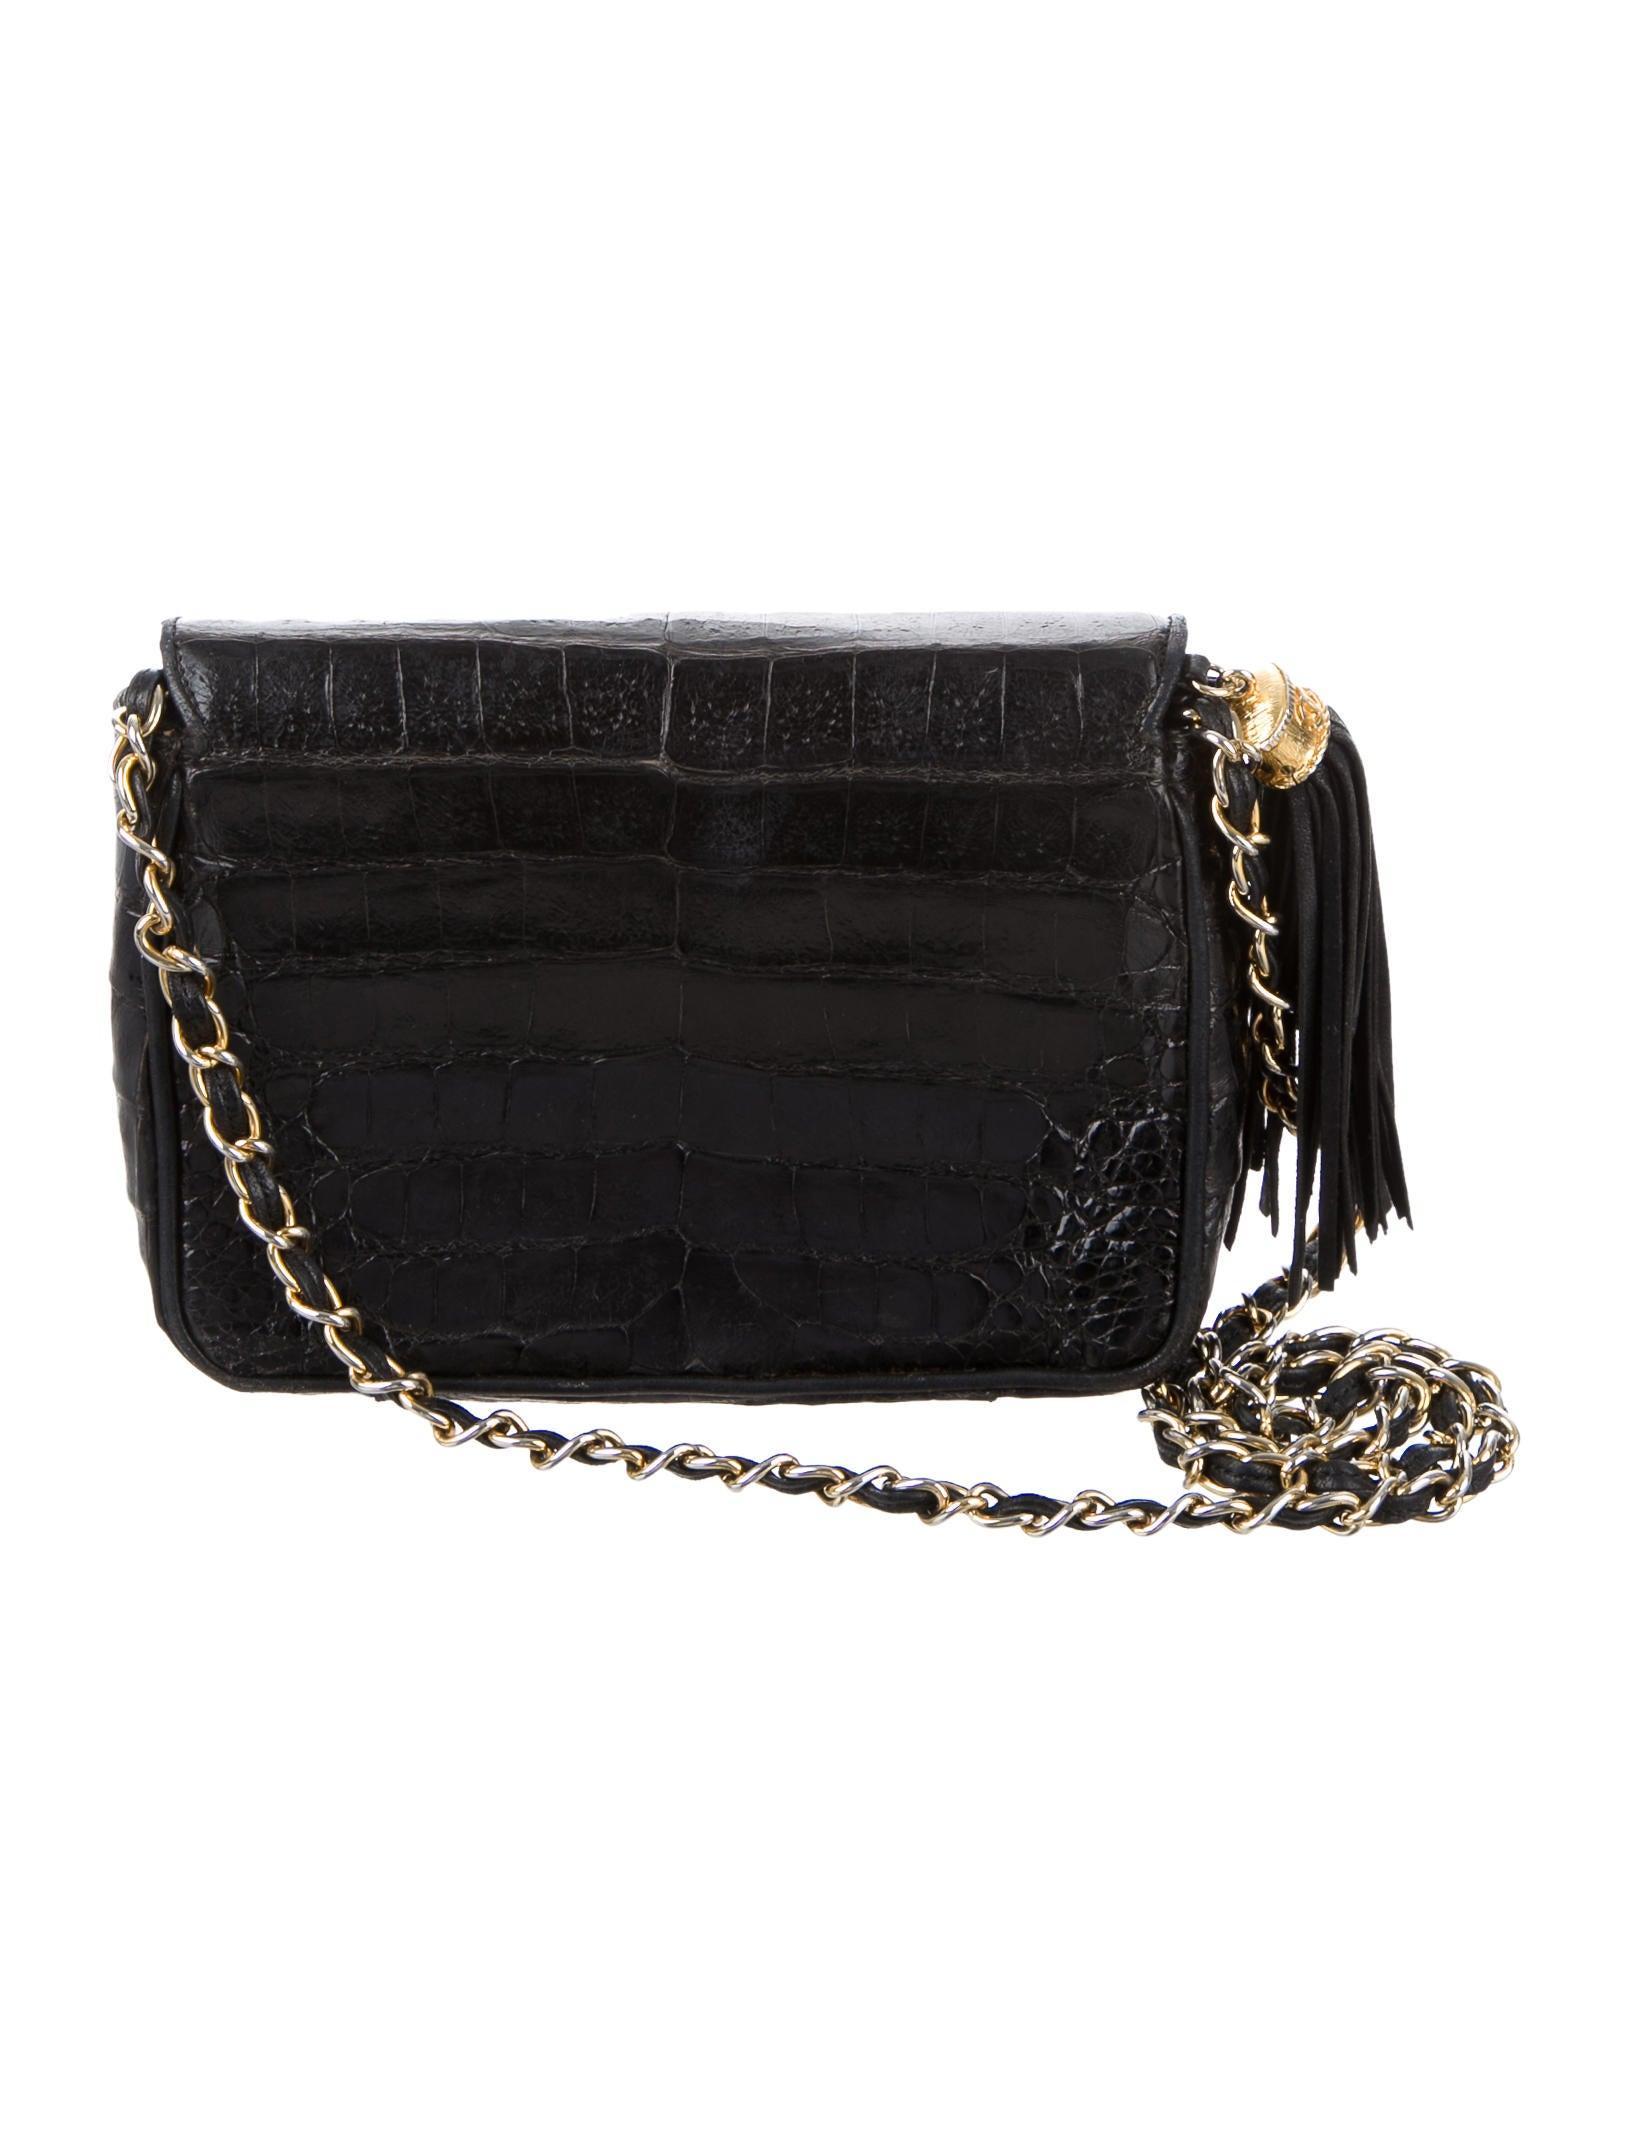 chanel crocodile flap bag handbags cha157919 the